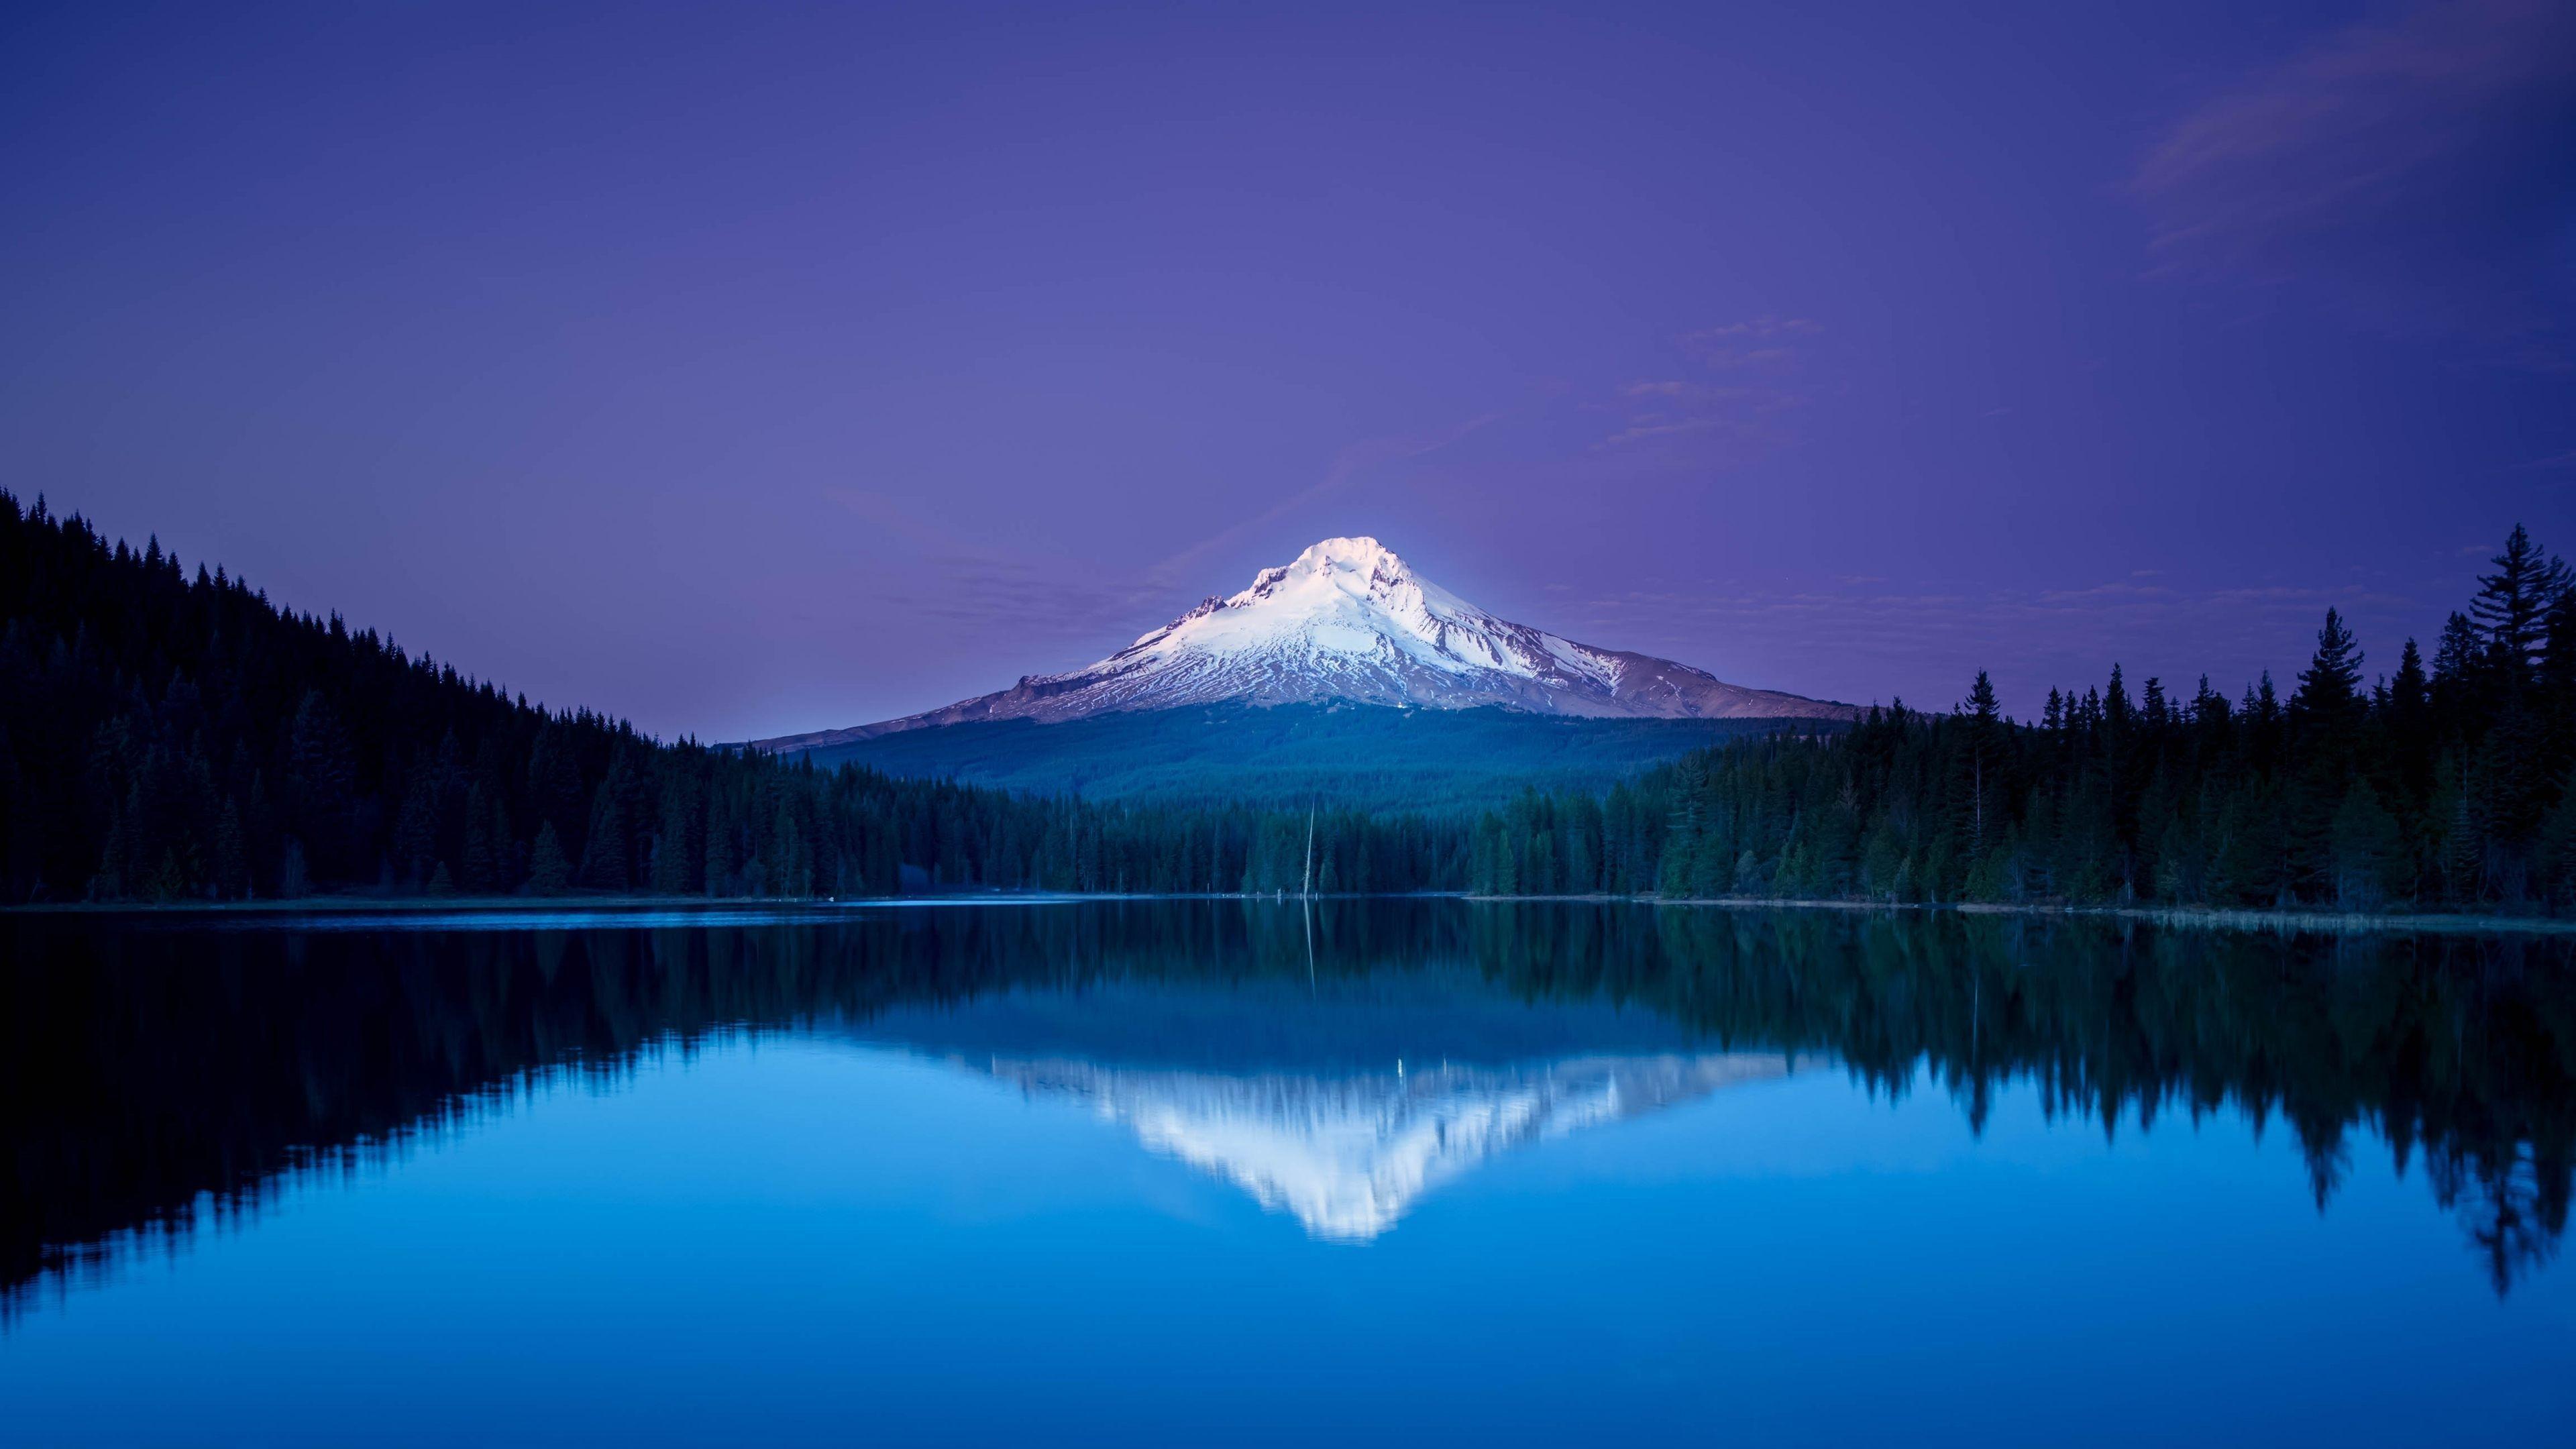 4K Mountain Wallpapers - Top Free 4K Mountain Backgrounds ...